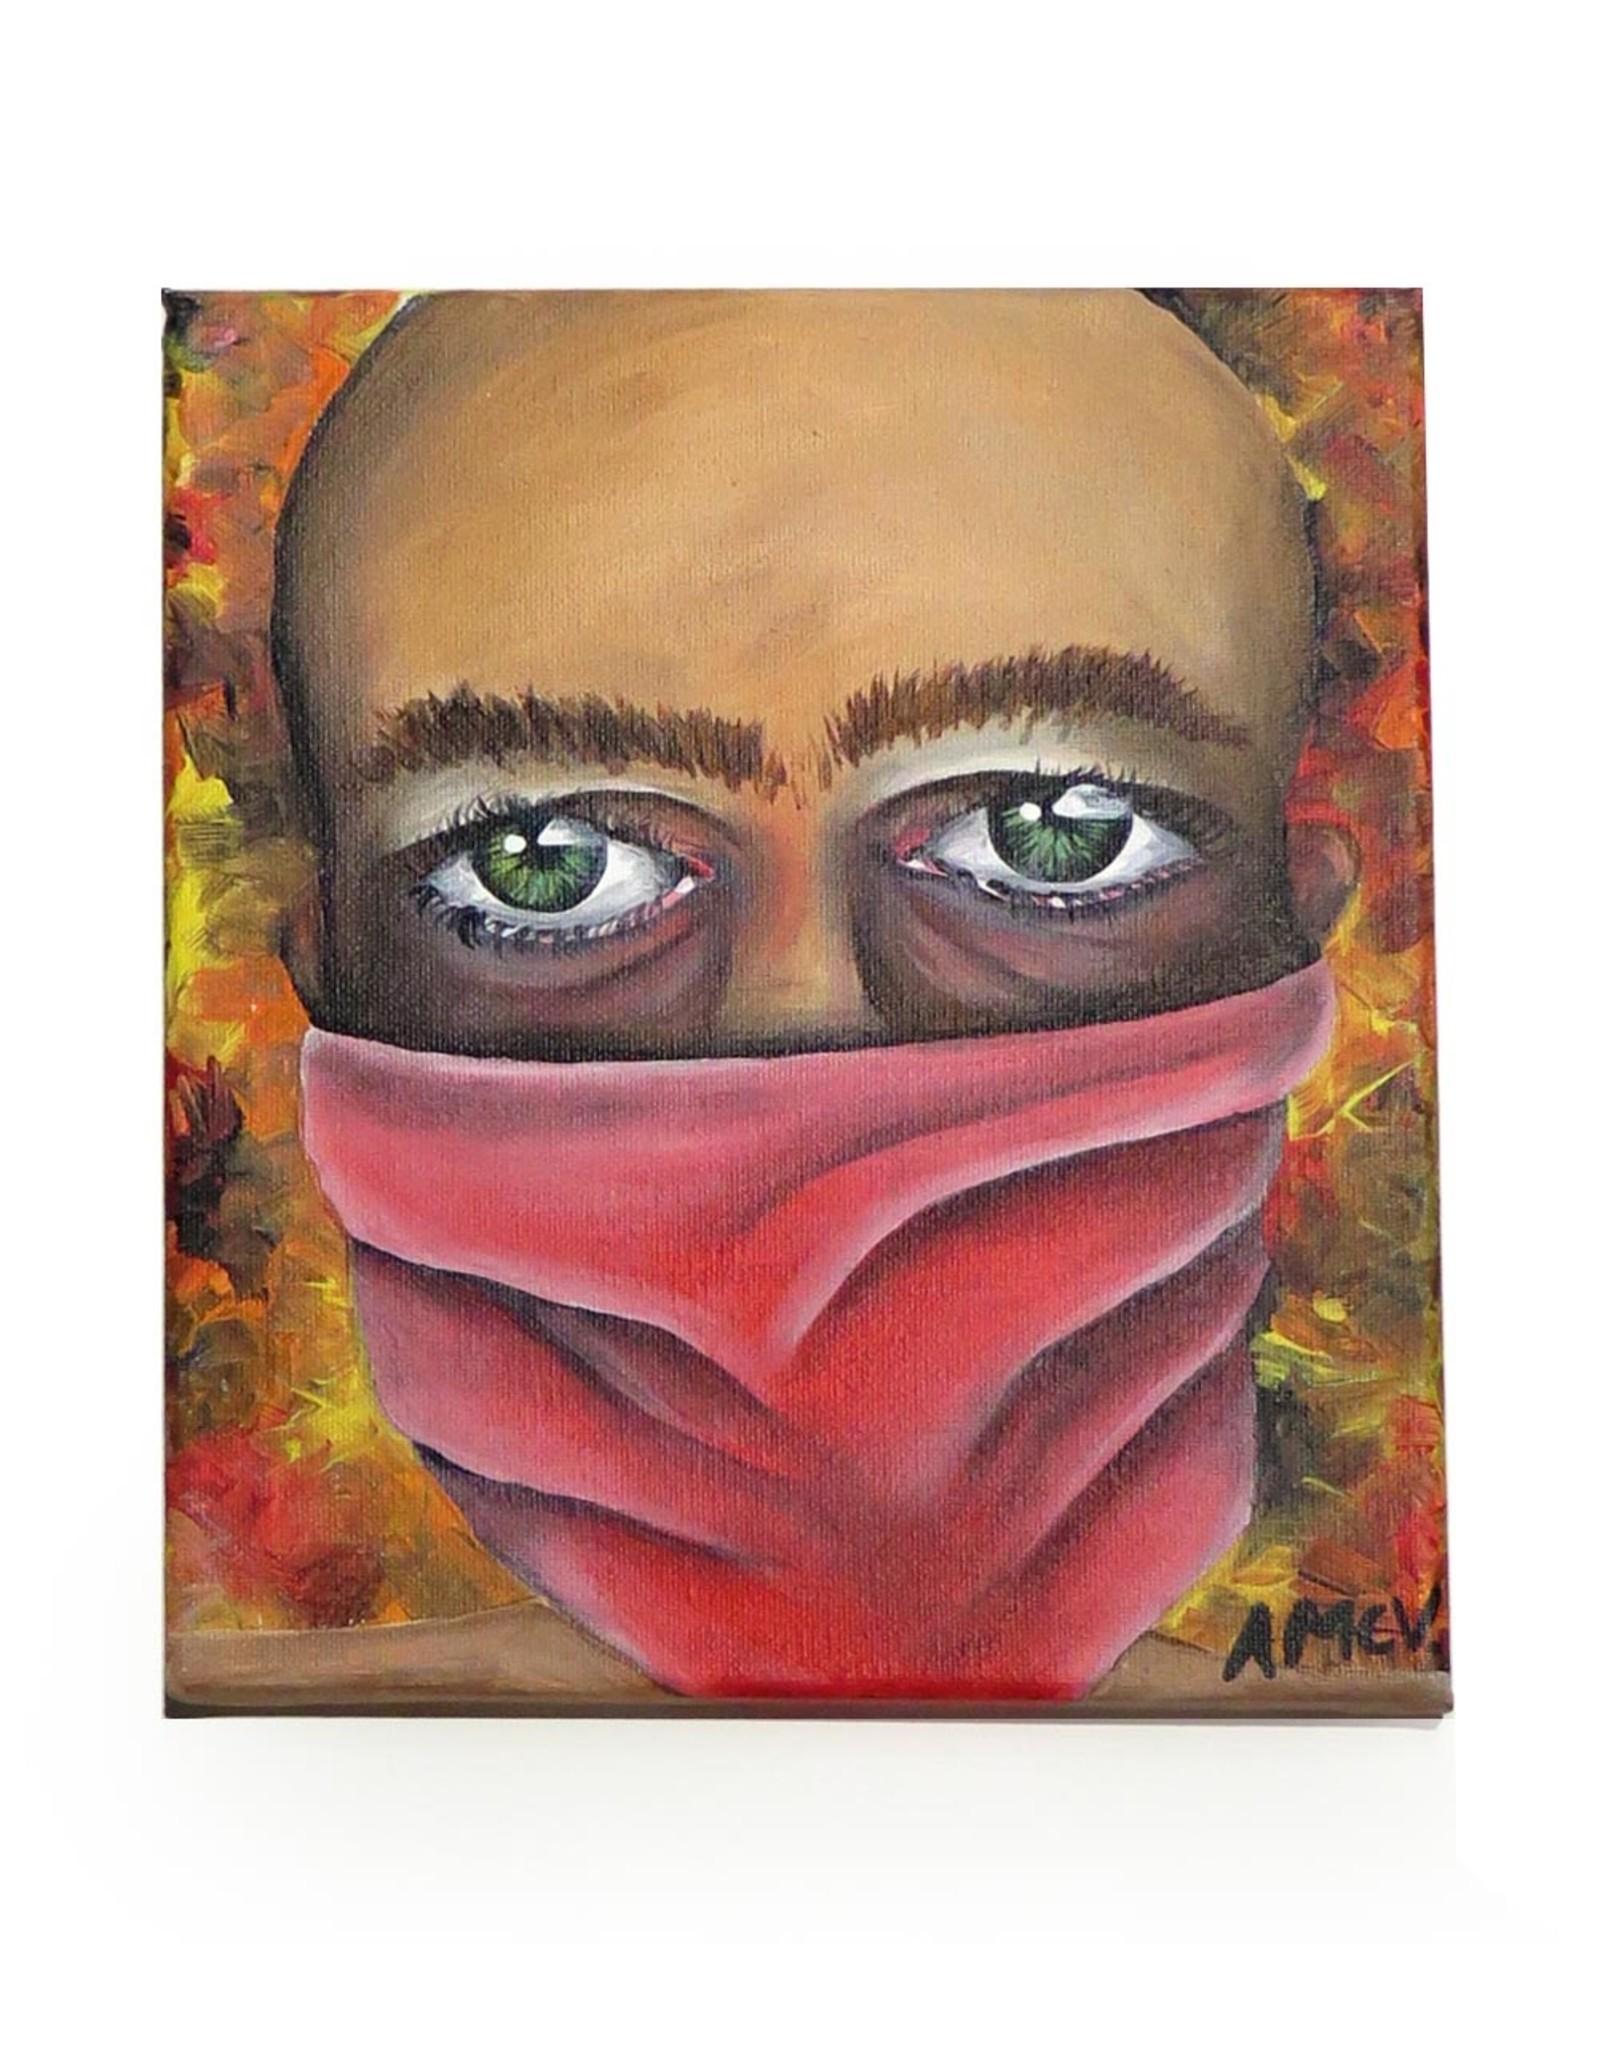 "AMCV ""Self-Portrait"" 6 acrylic on canvas by AMCV"